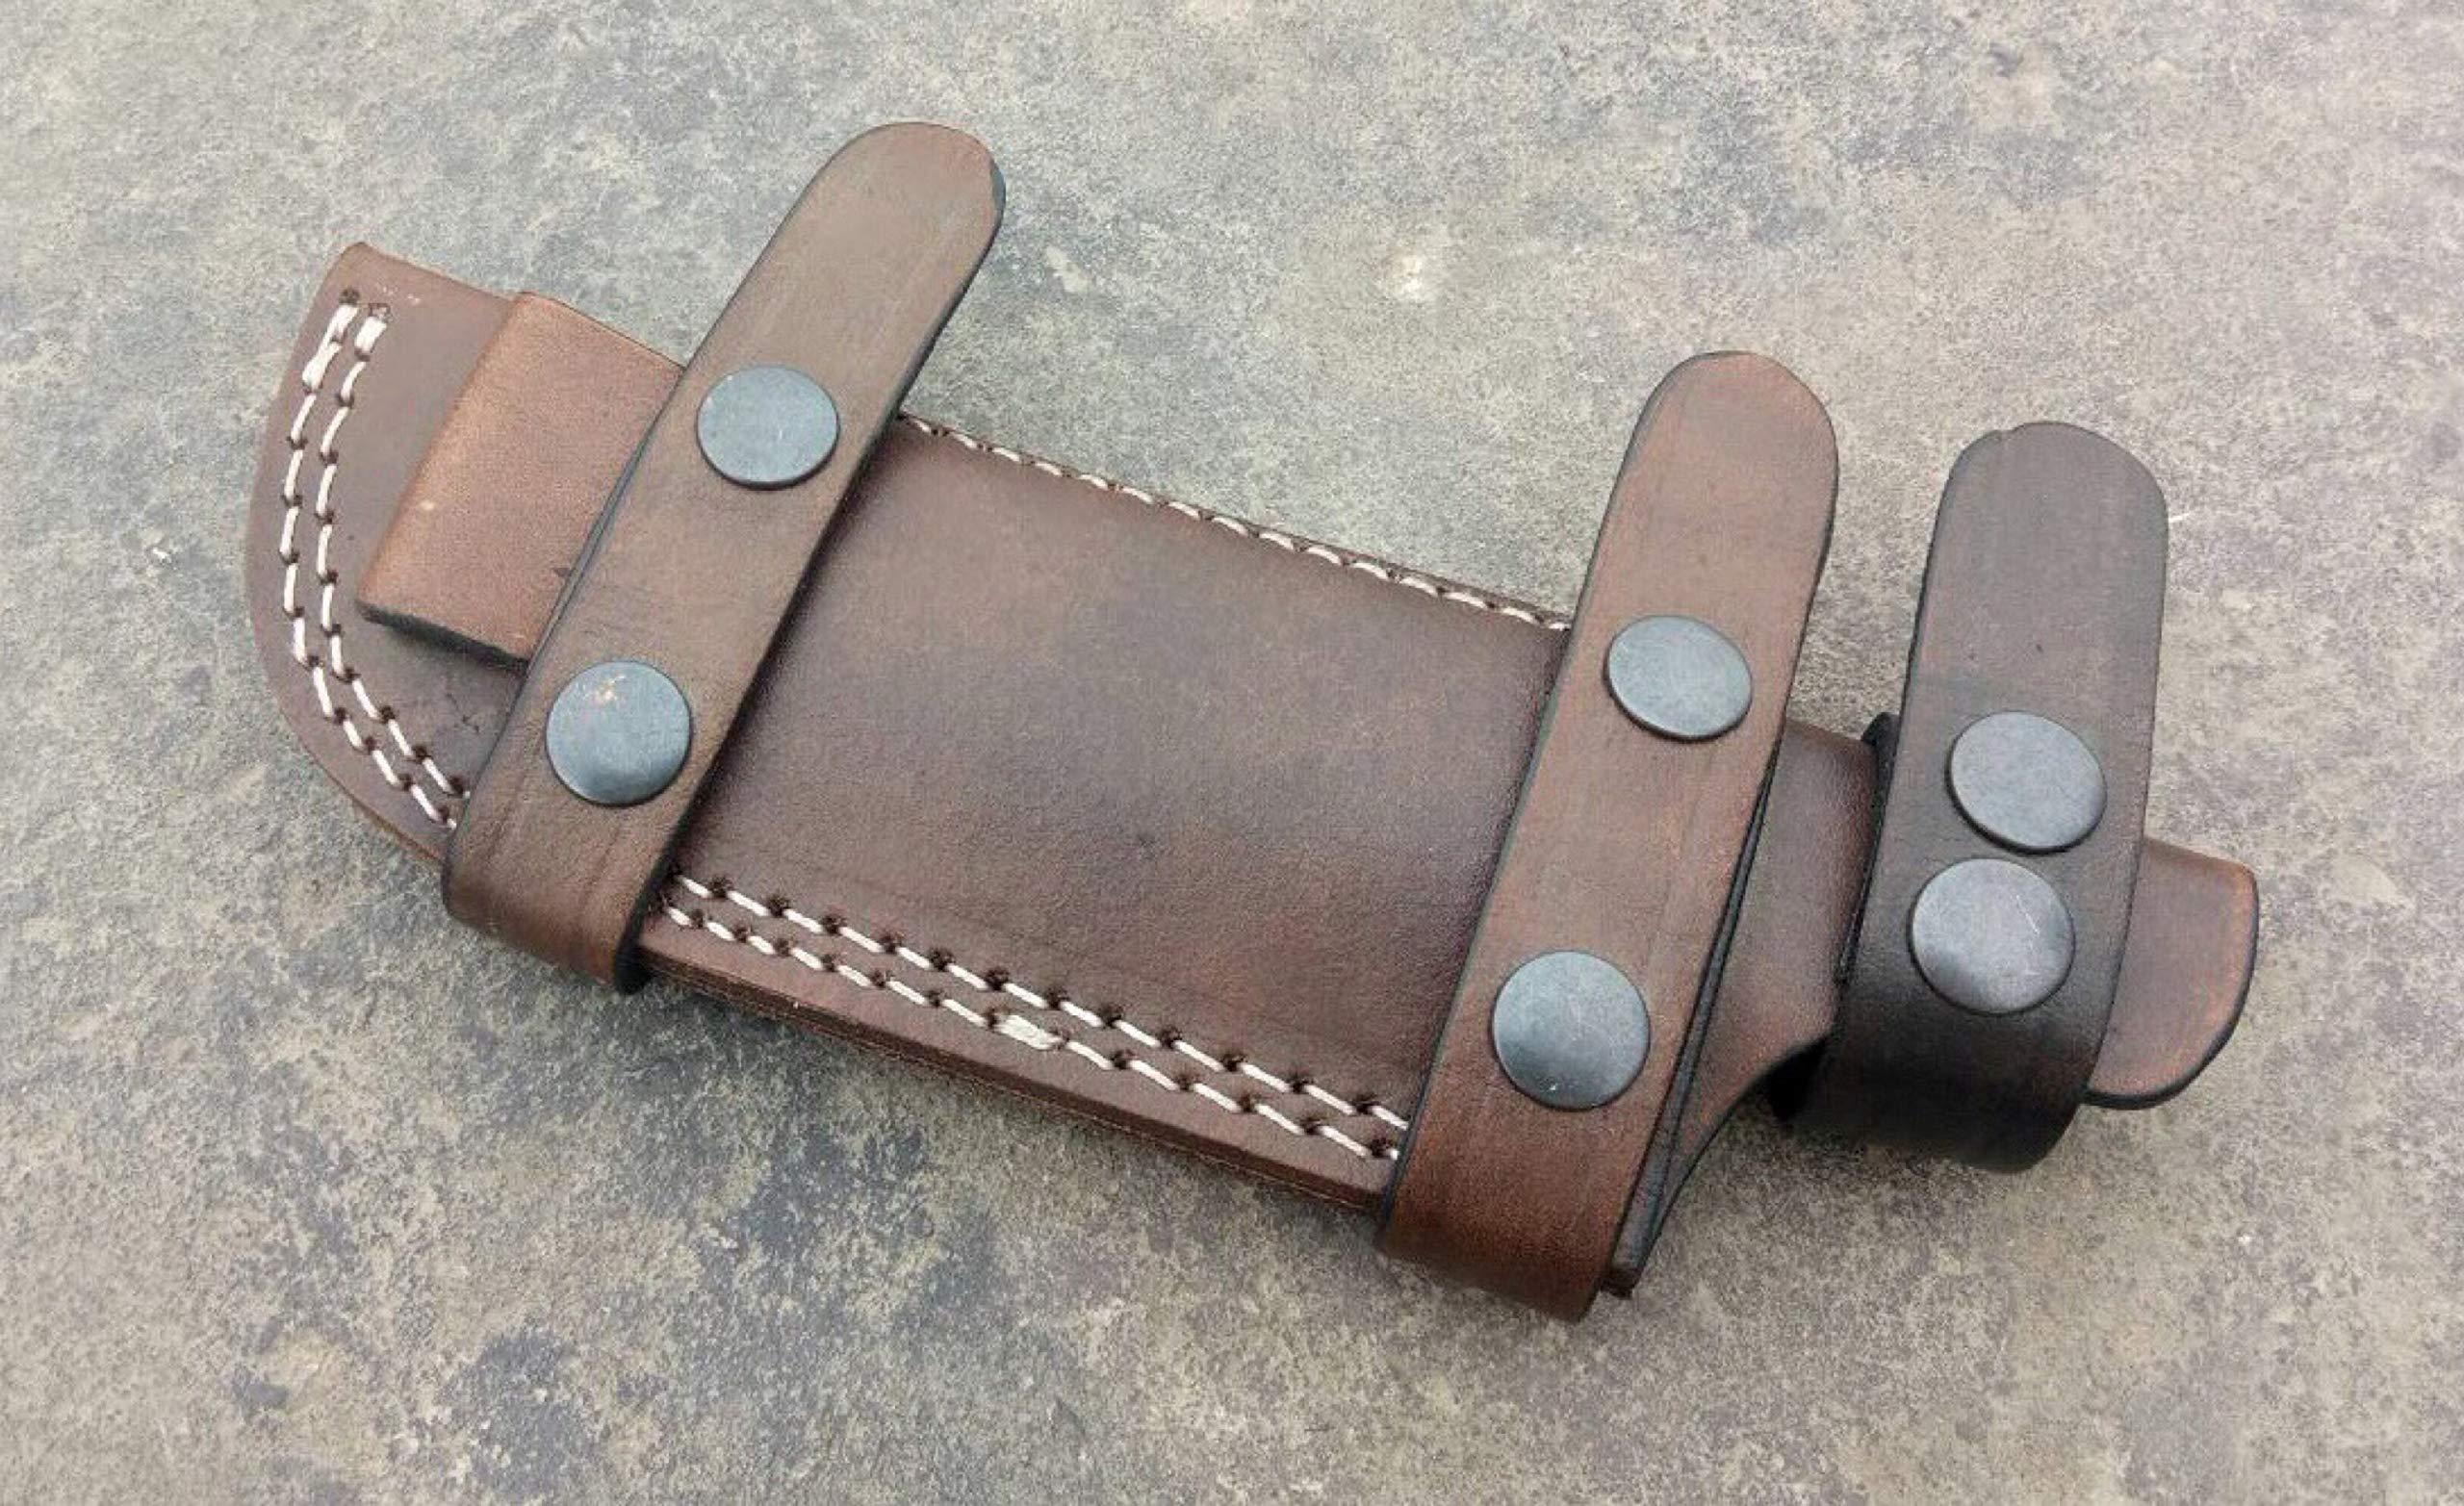 Ottoza Custom Handmade Dark Brown Right Hand Leather Knife Sheath for Tracker Knife - Bushcraft Knife - Hunting Knife - Survival Knife - Skinning Knife Horizontal Scout / Cow - Buffalo Leather No:39   by Ottoza